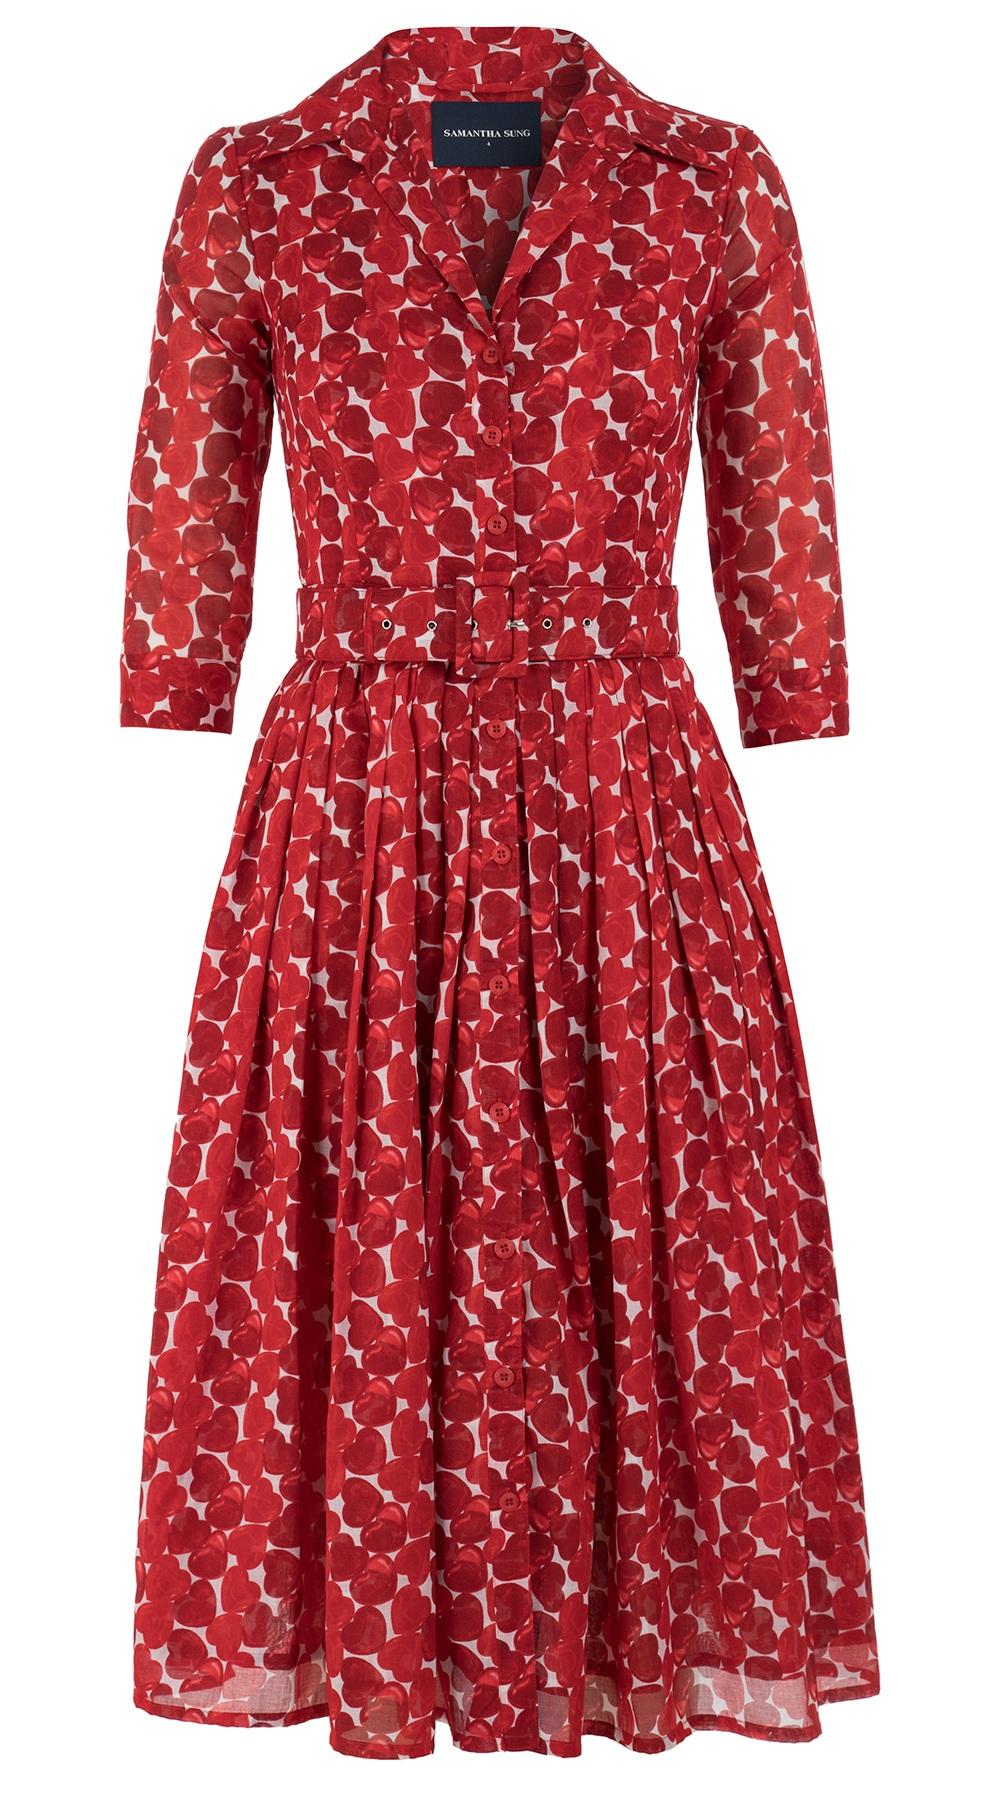 Cezanne Heart_White Red_Audrey Dress #2 Shirt Collar 3-4 Sleeve_Midi_Musola_Front-2